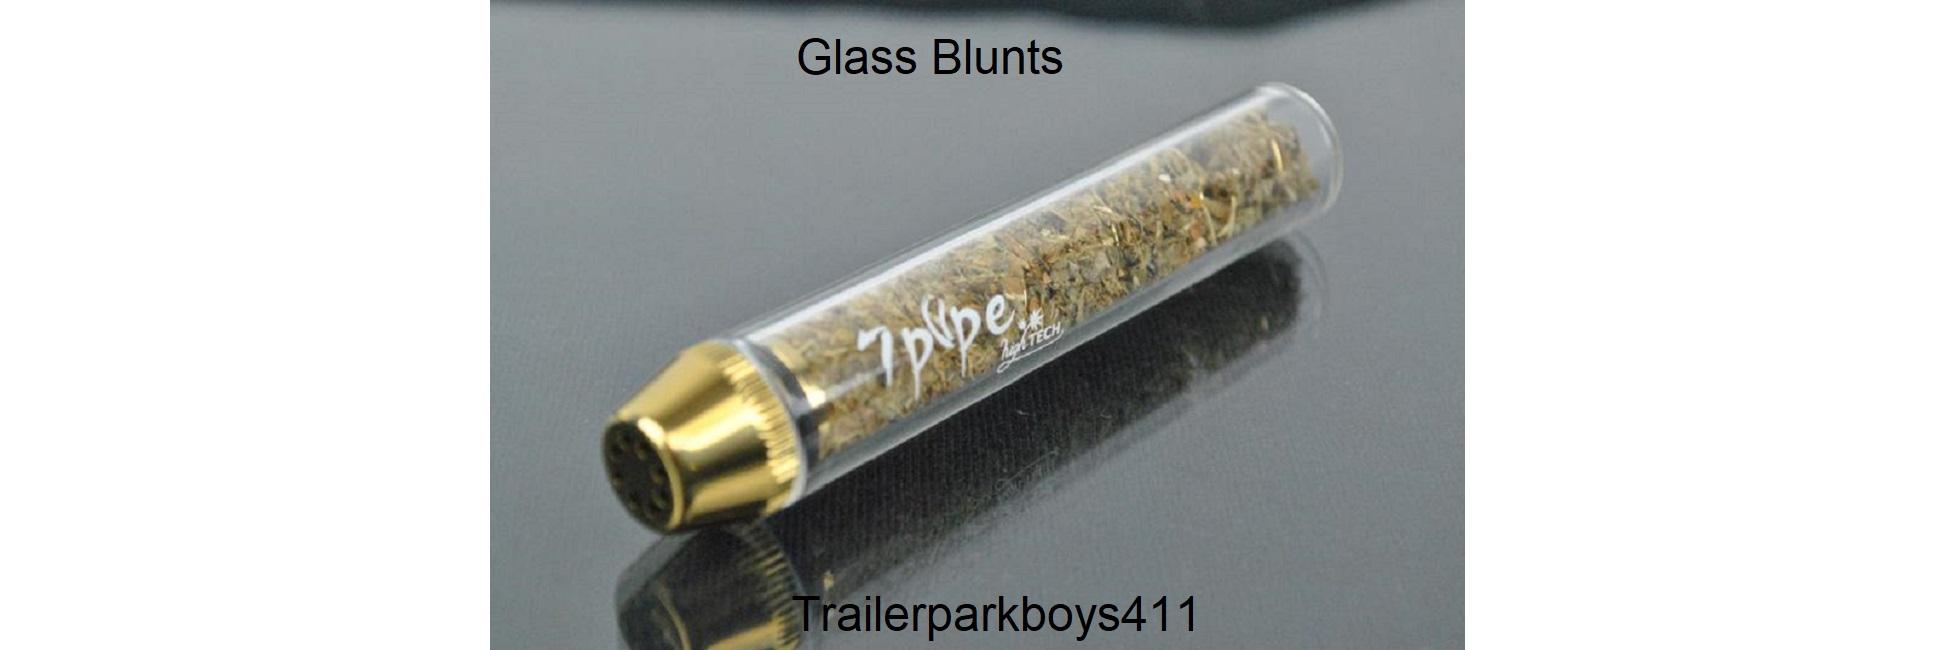 Glass Blunts